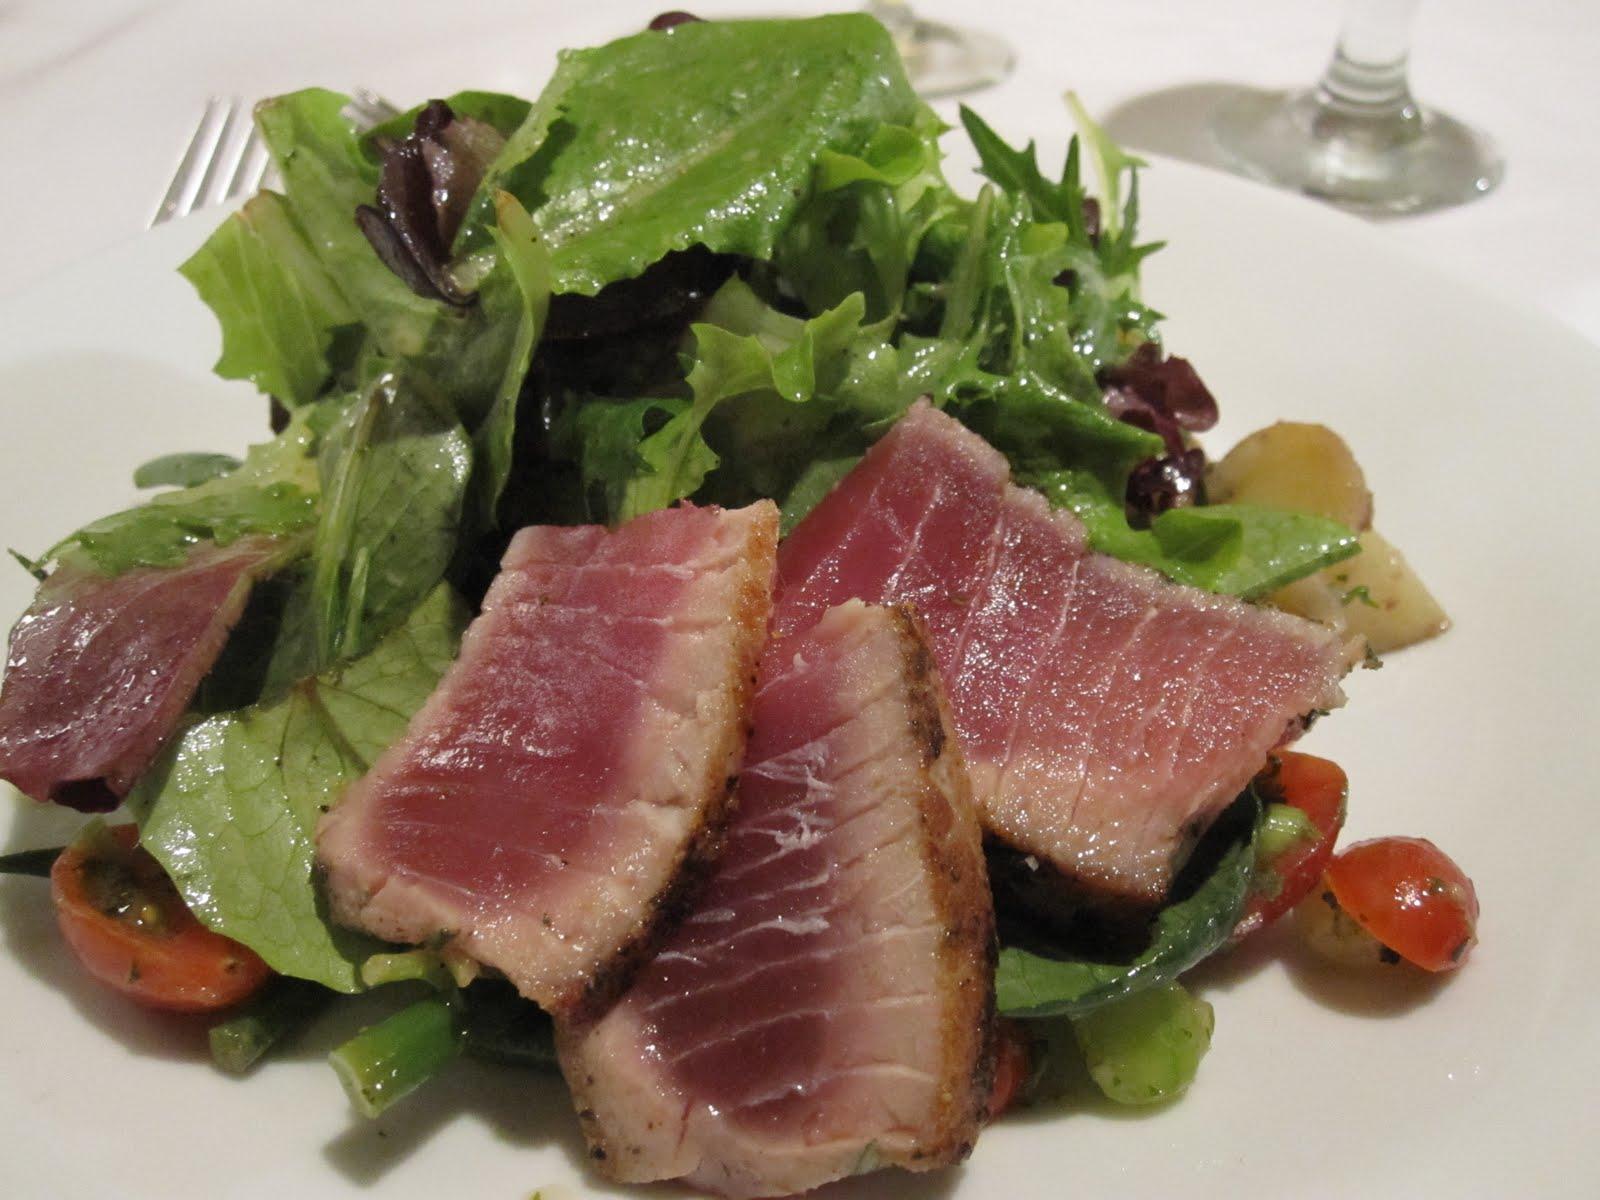 Winter Nicoise salad with sashimi grade ahi tuna, fingerling potatoes ...